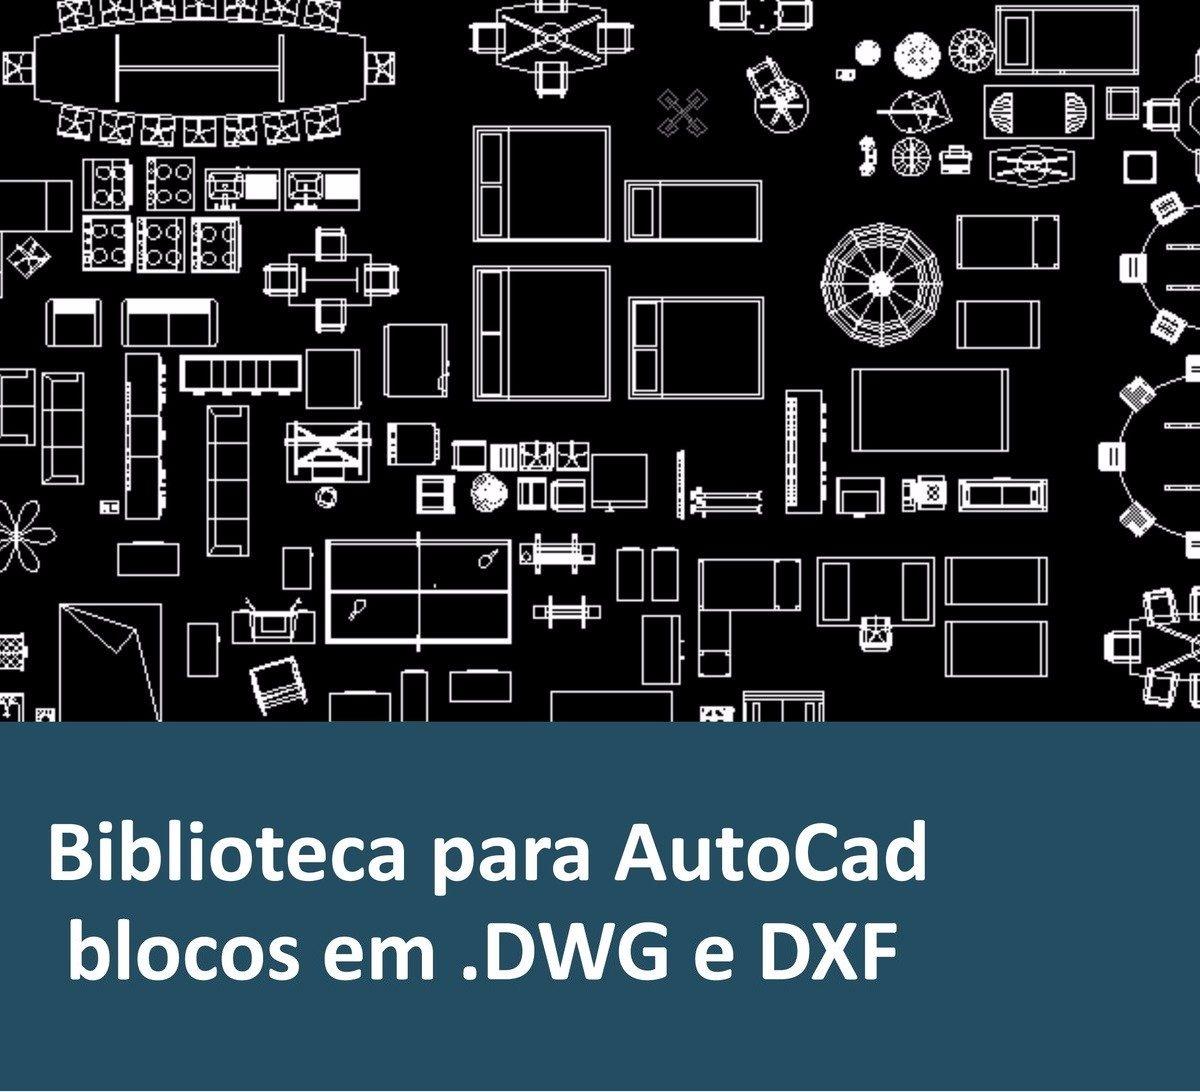 120 Mil Blocos Para O Autocad 2d E 3d Dwg E Dxf R 15 90 Em